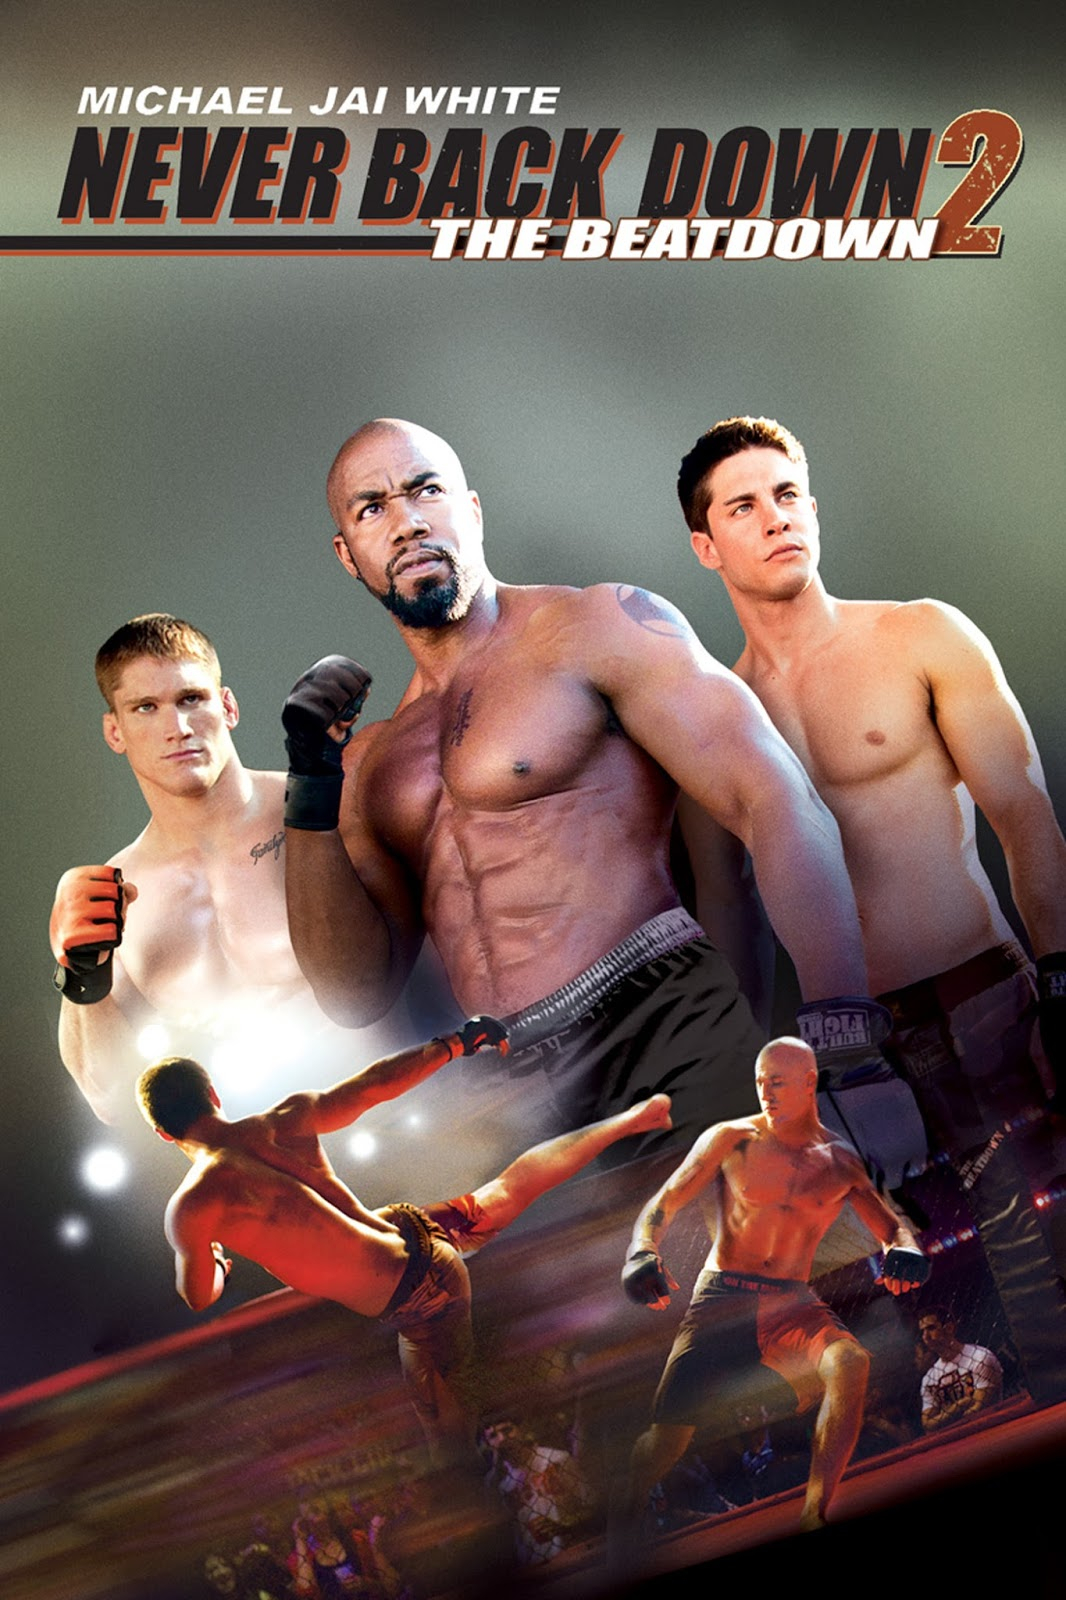 Never Back Down 2: The Beatdown (2011) ταινιες online seires oipeirates greek subs